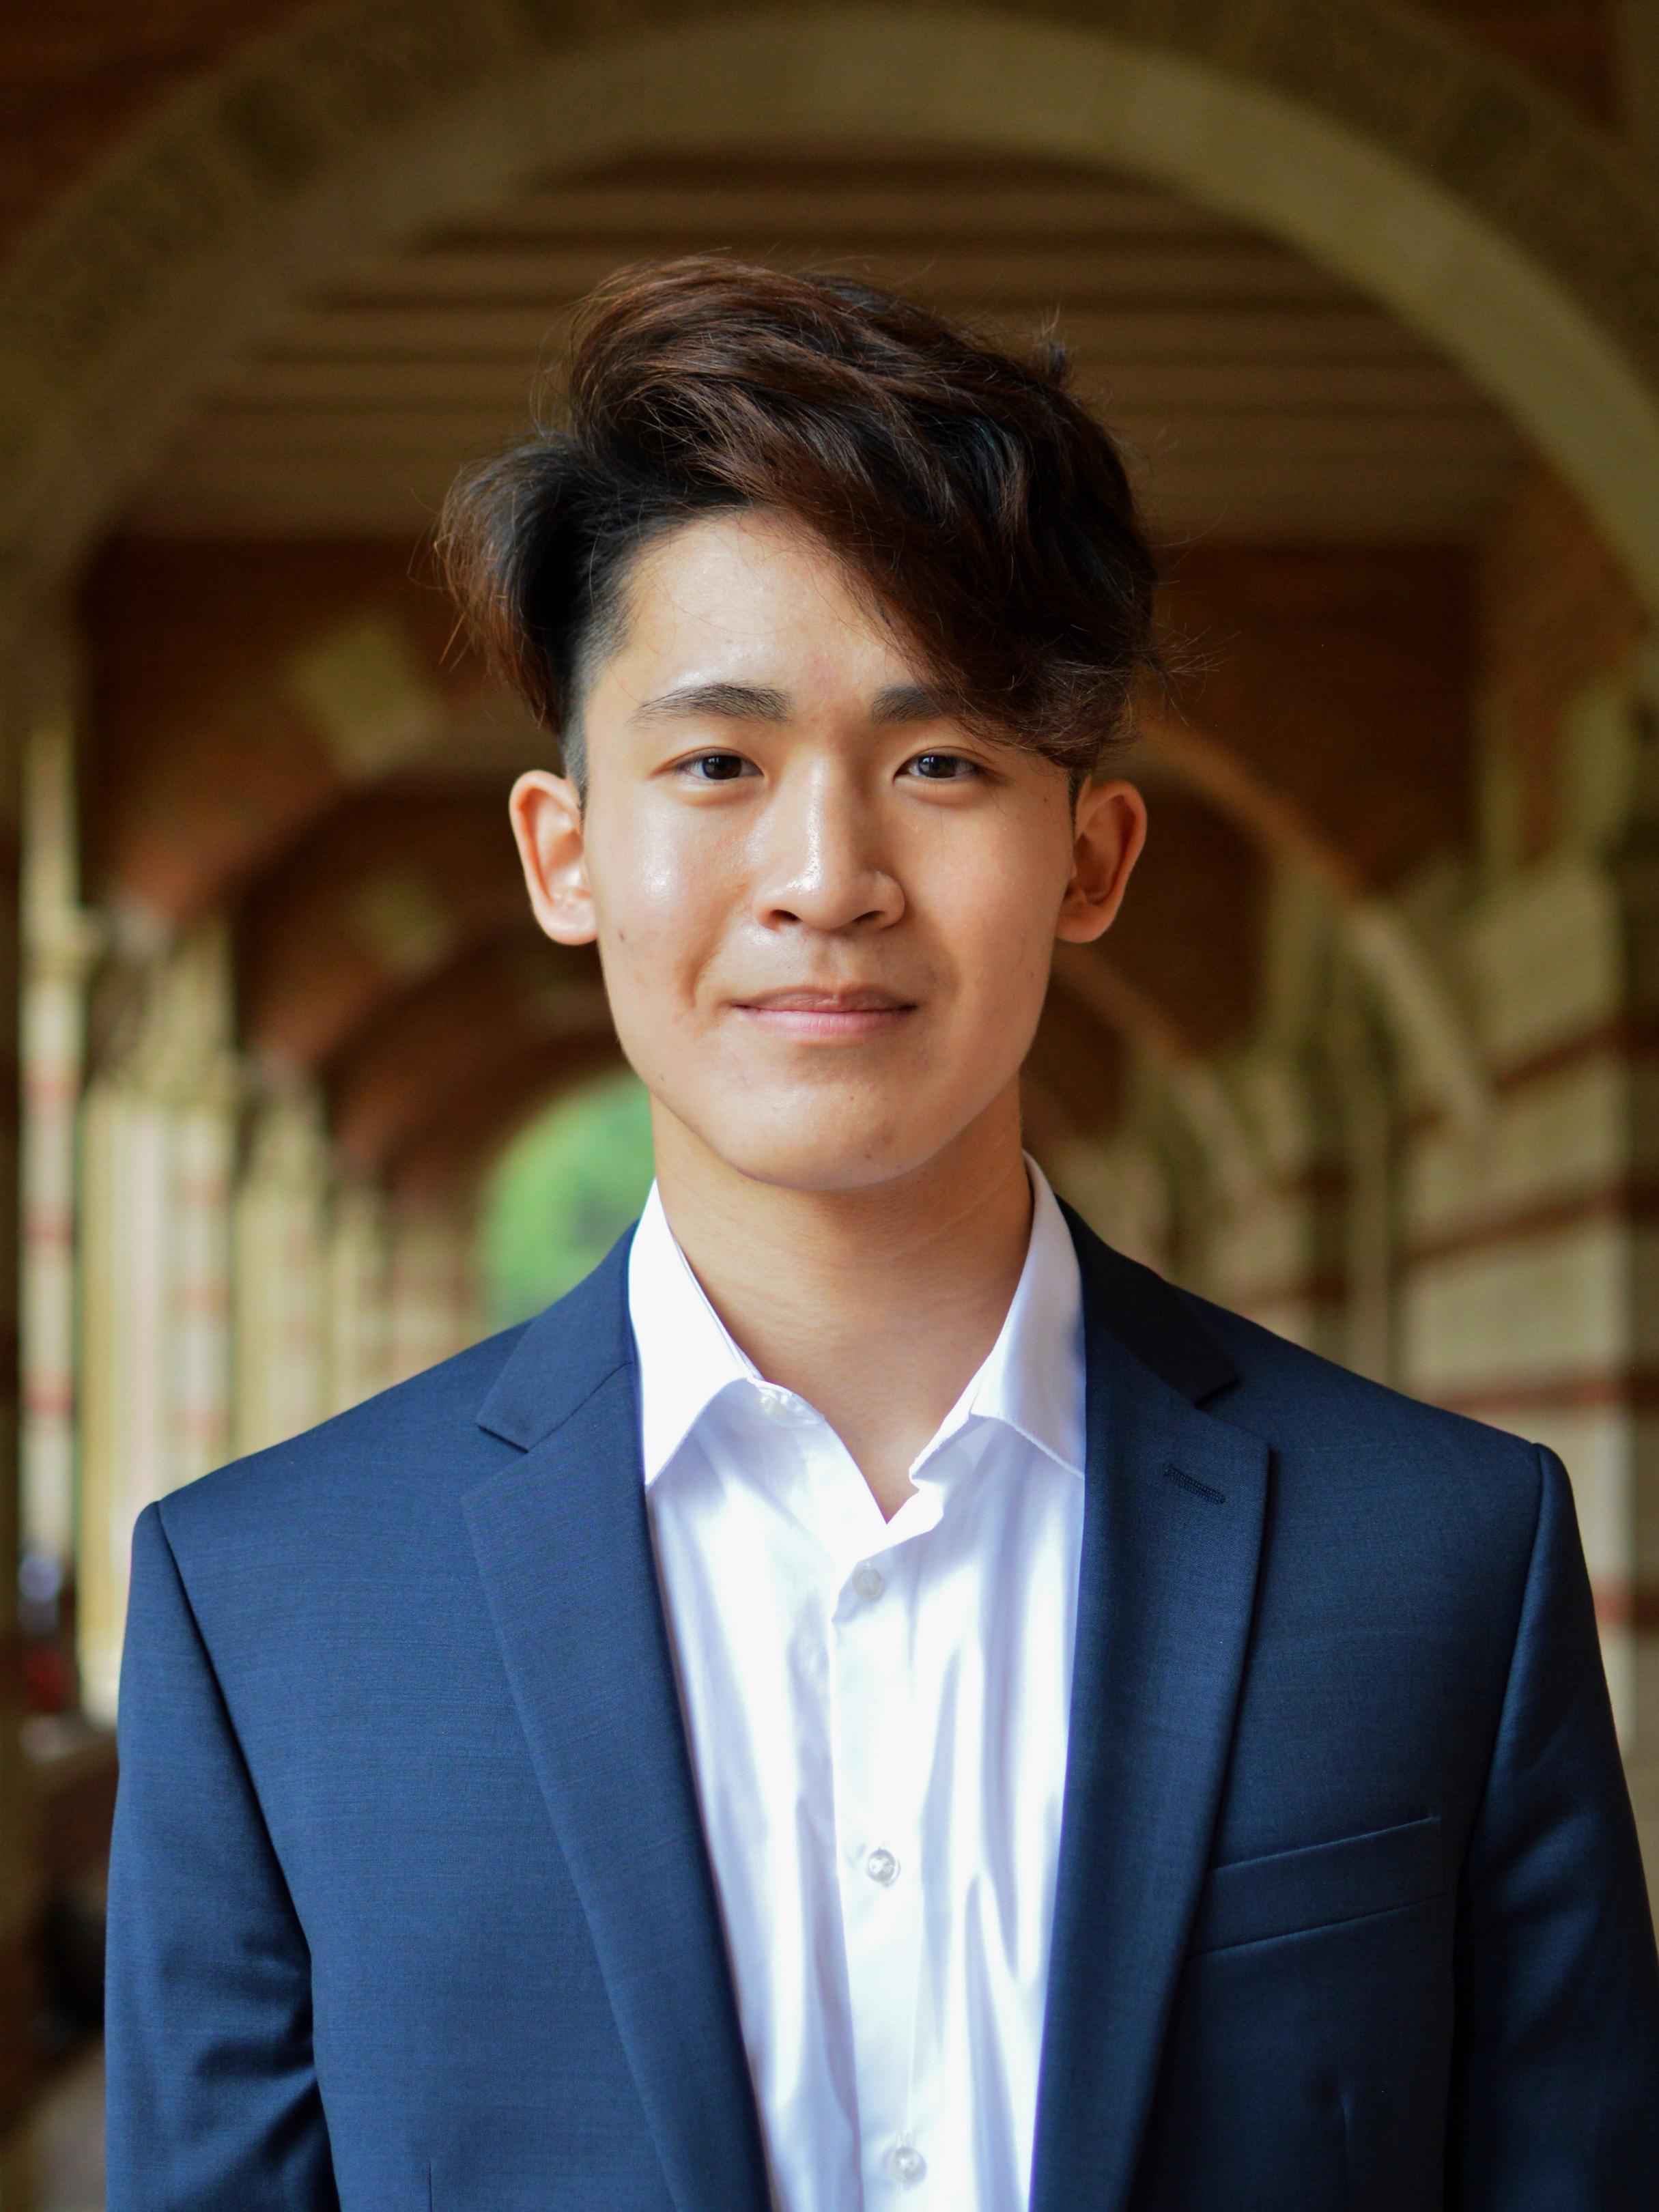 JACK ZHANG - Alpha Rho | Class of 2021